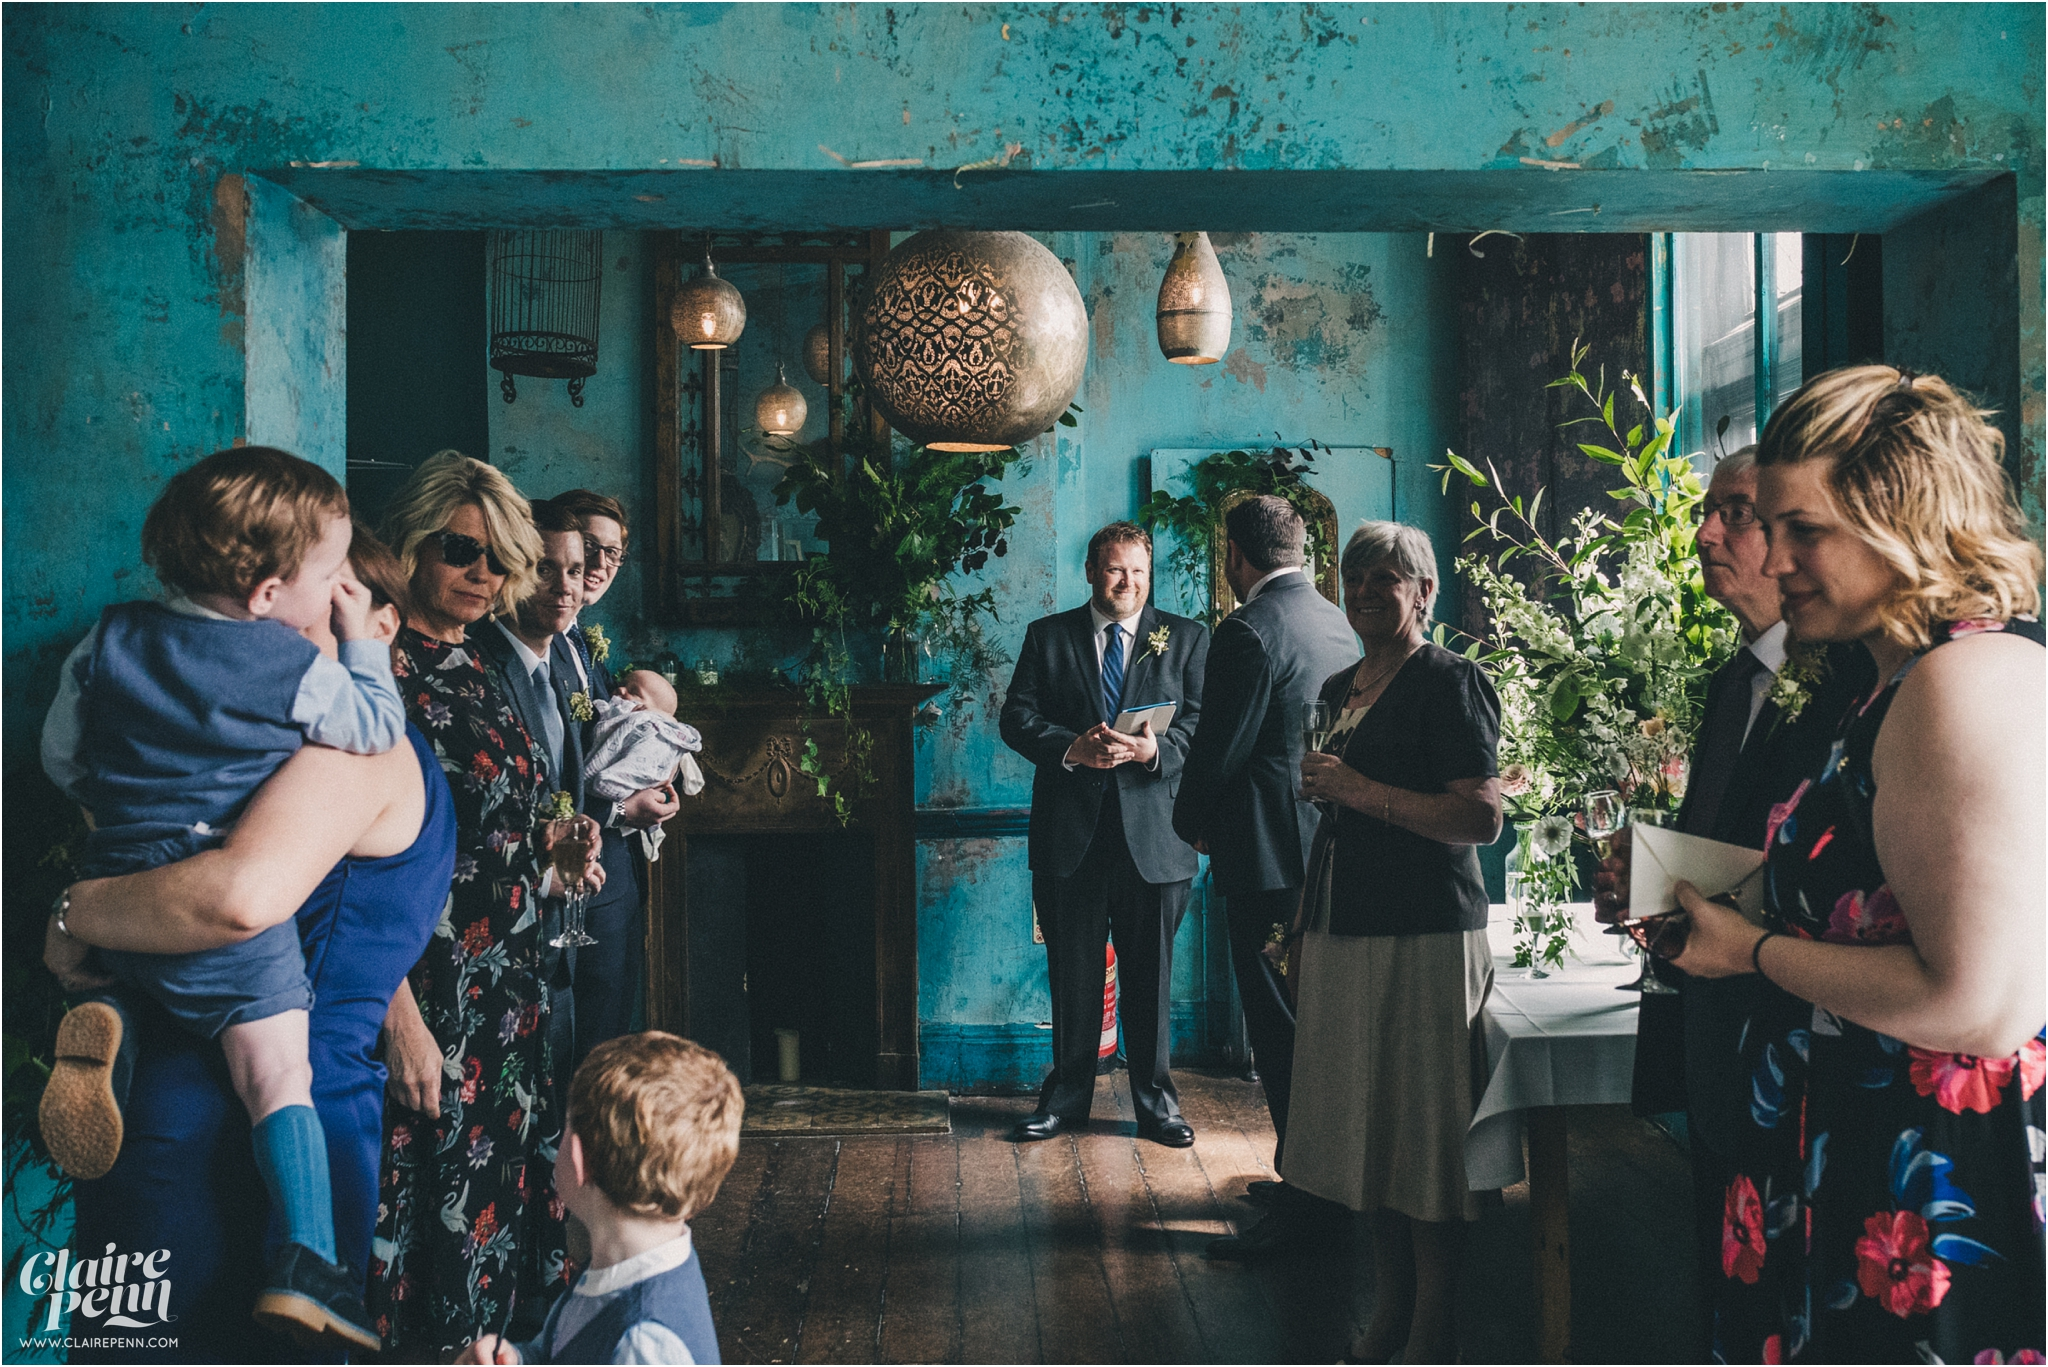 Paradise by way of Kensall Green London pub intimate wedding_0016.jpg